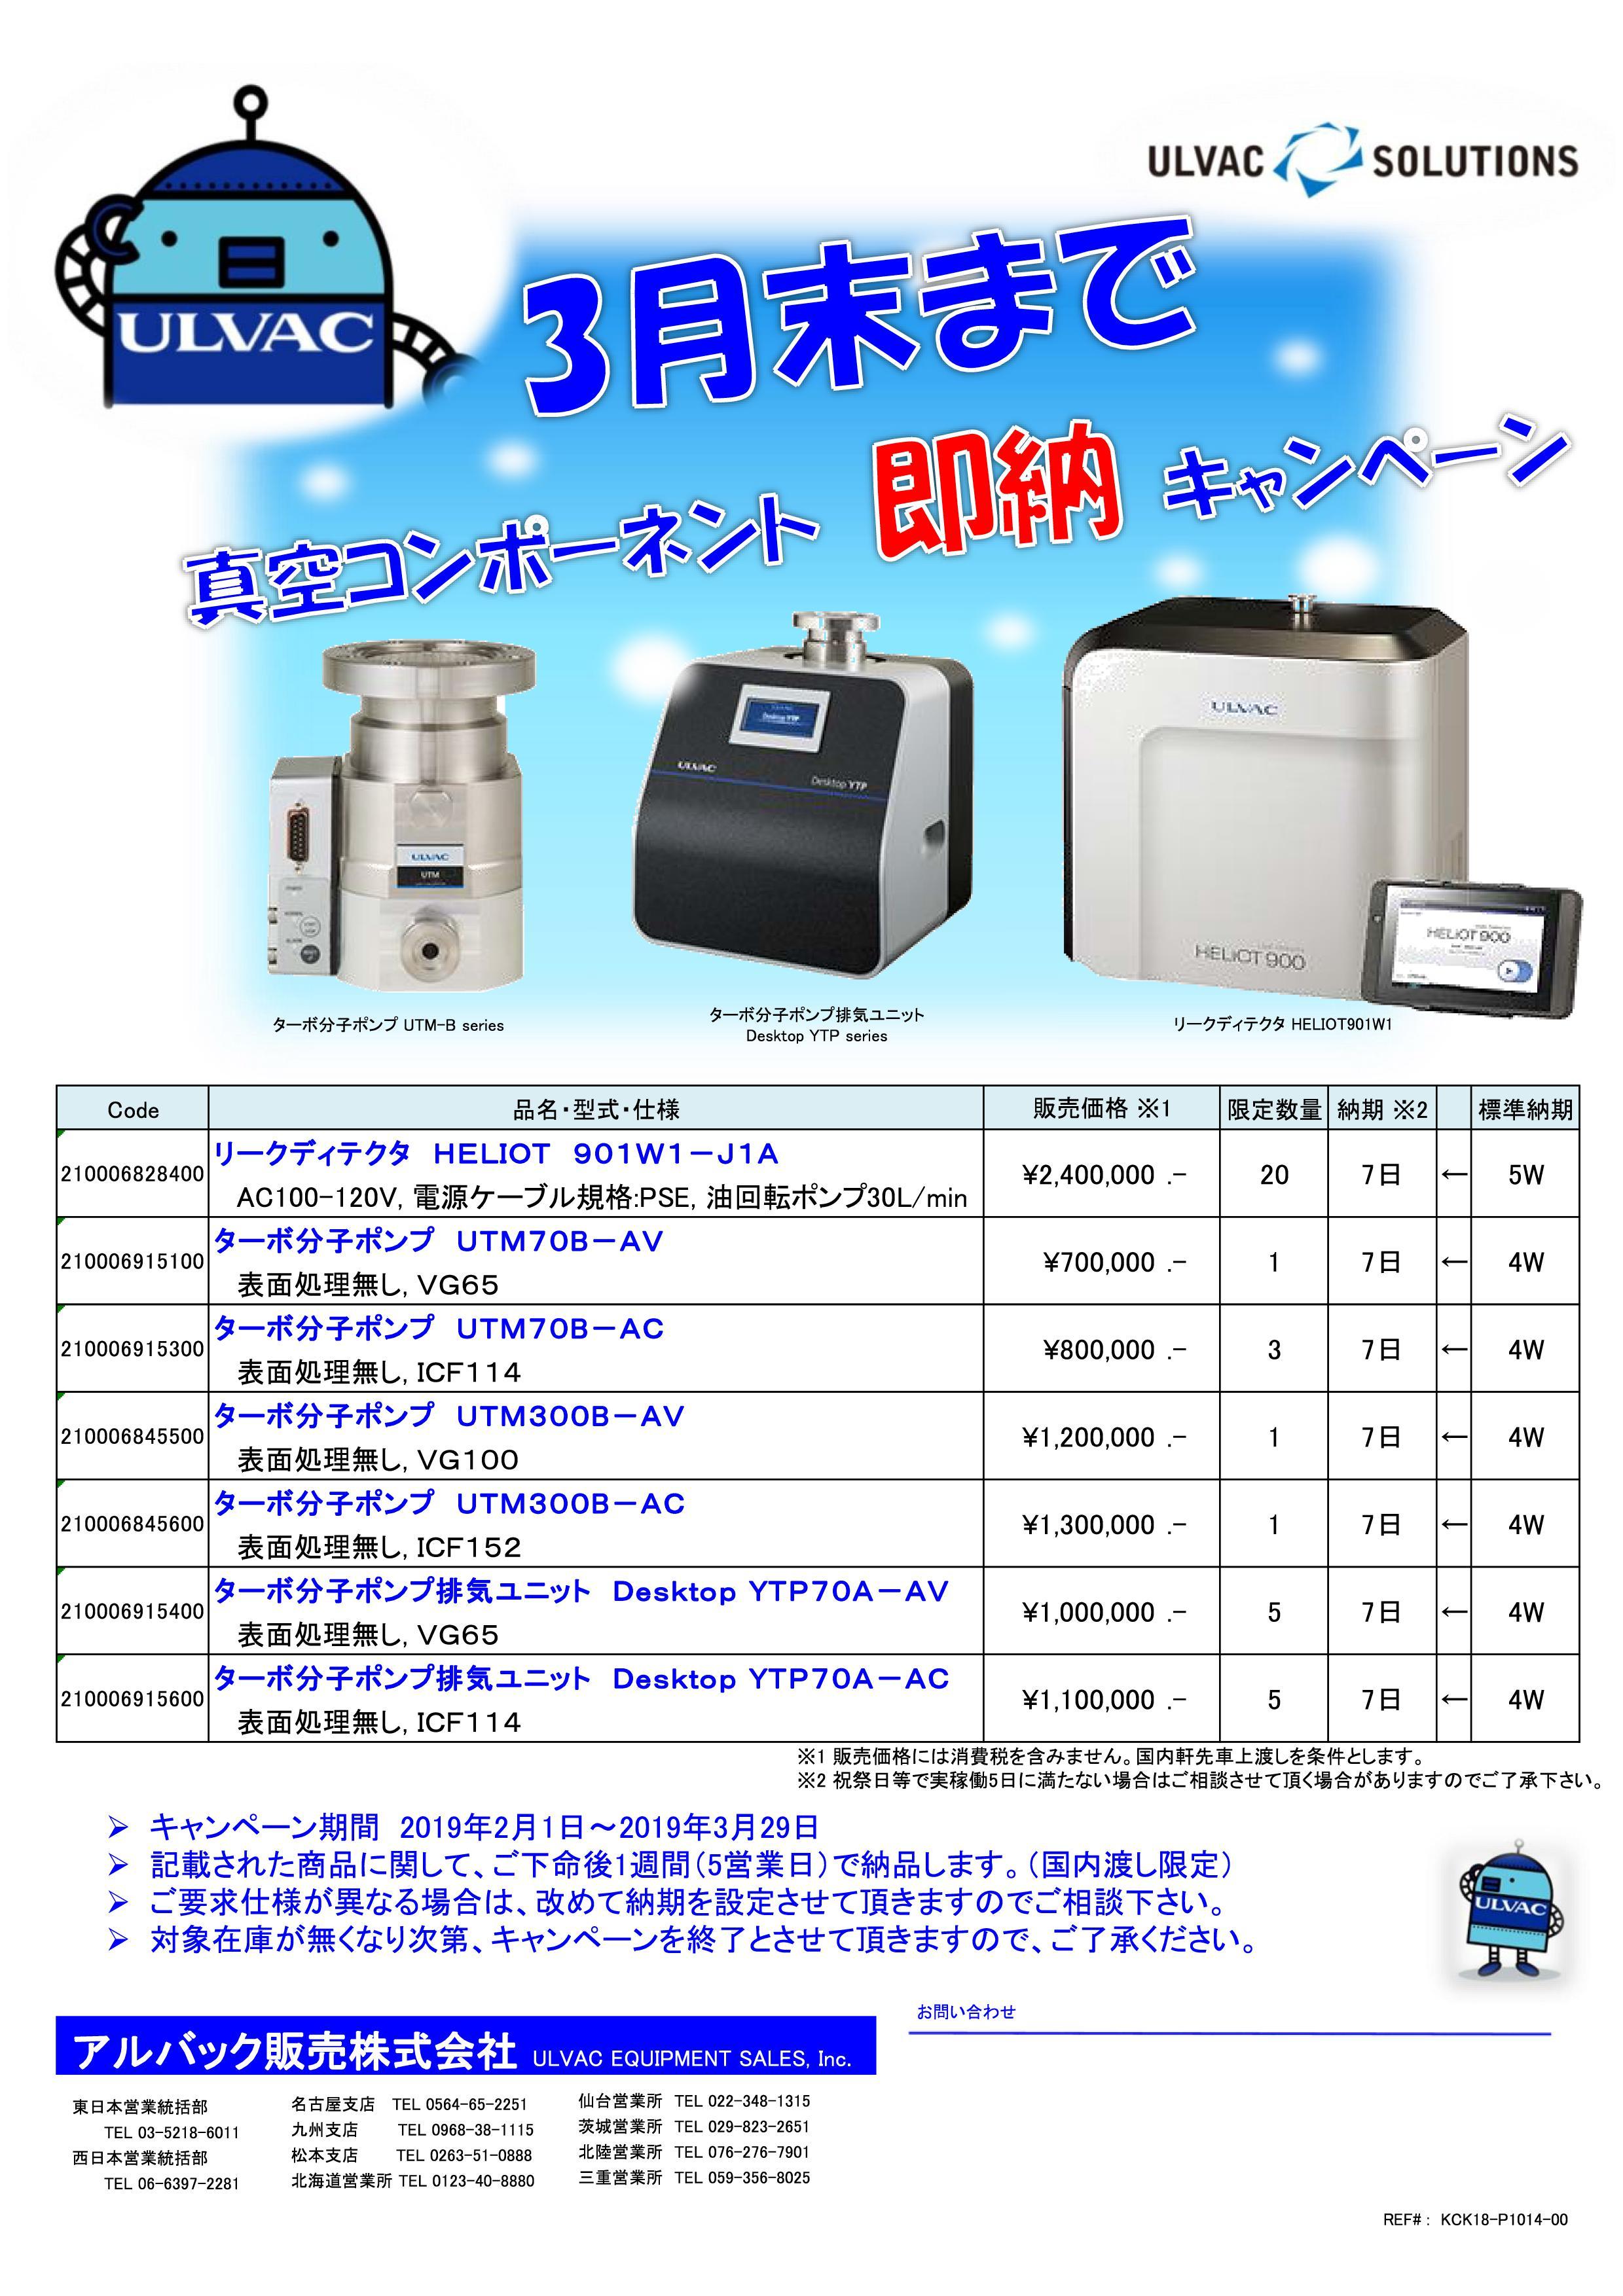 KCK18-P1014-00_即納キャンペーンチラシ_2018